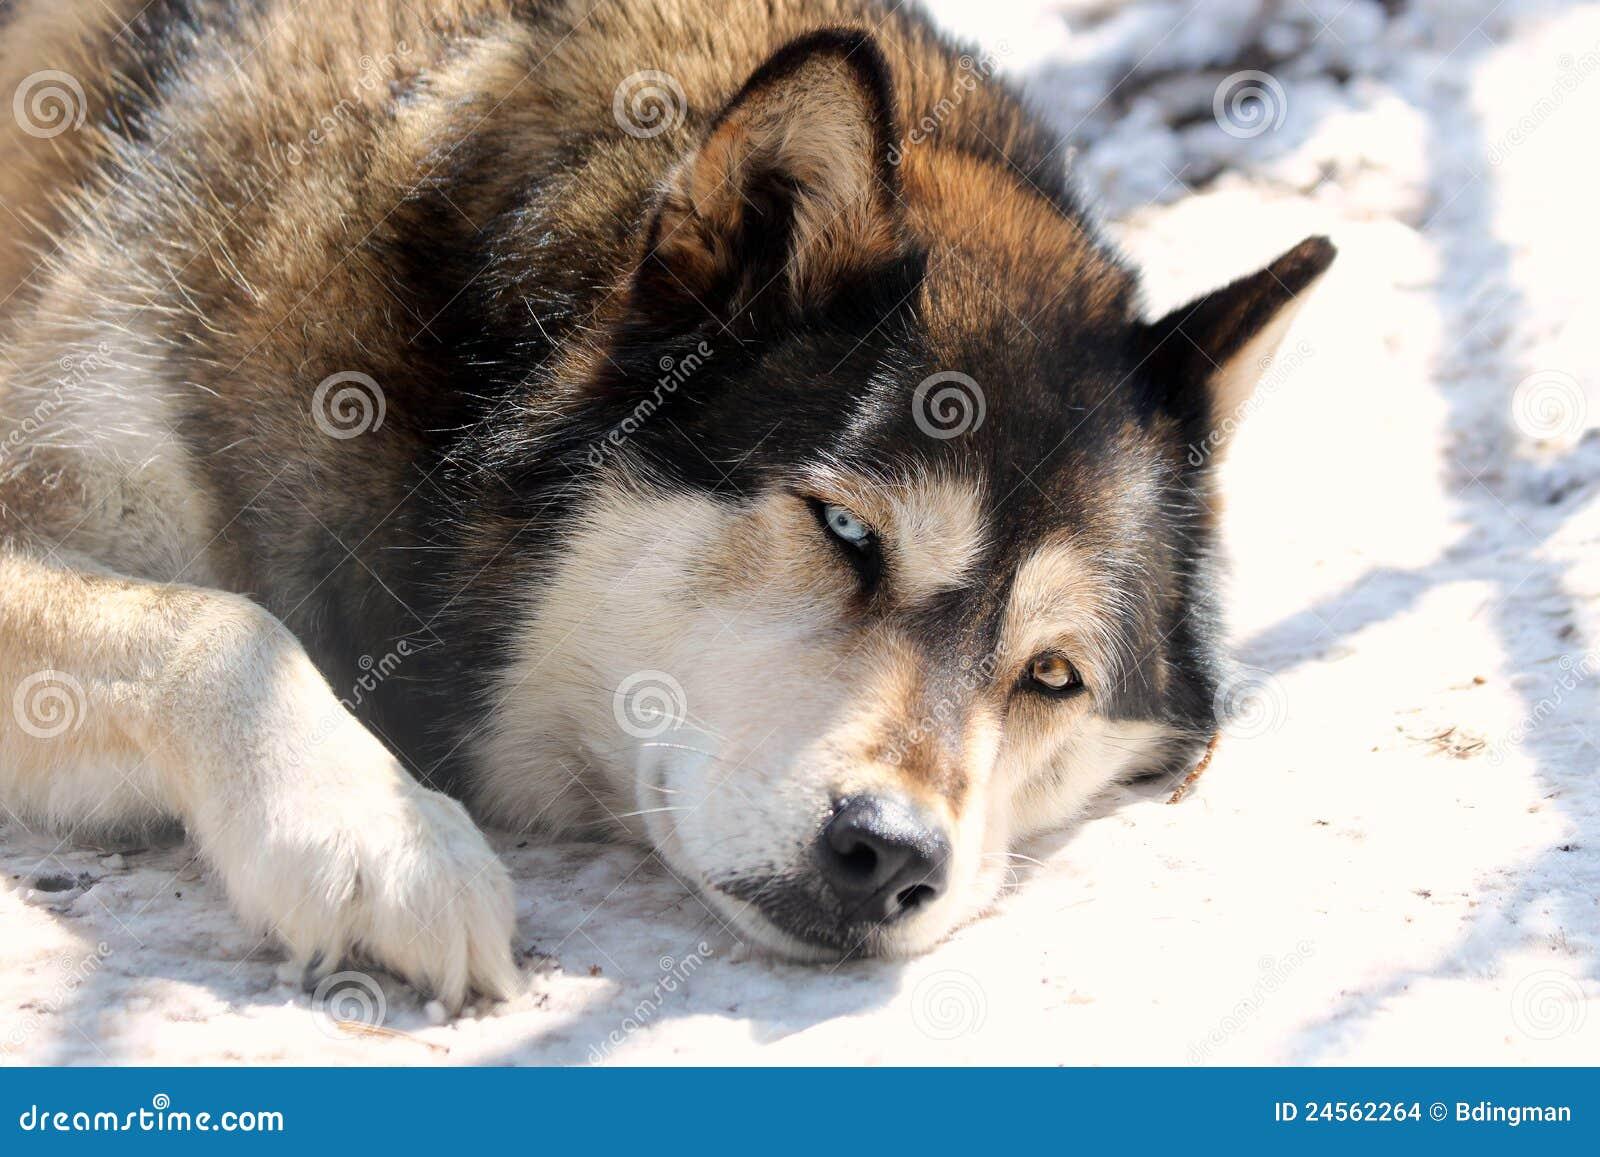 sleepy wolf stock images image 24562264